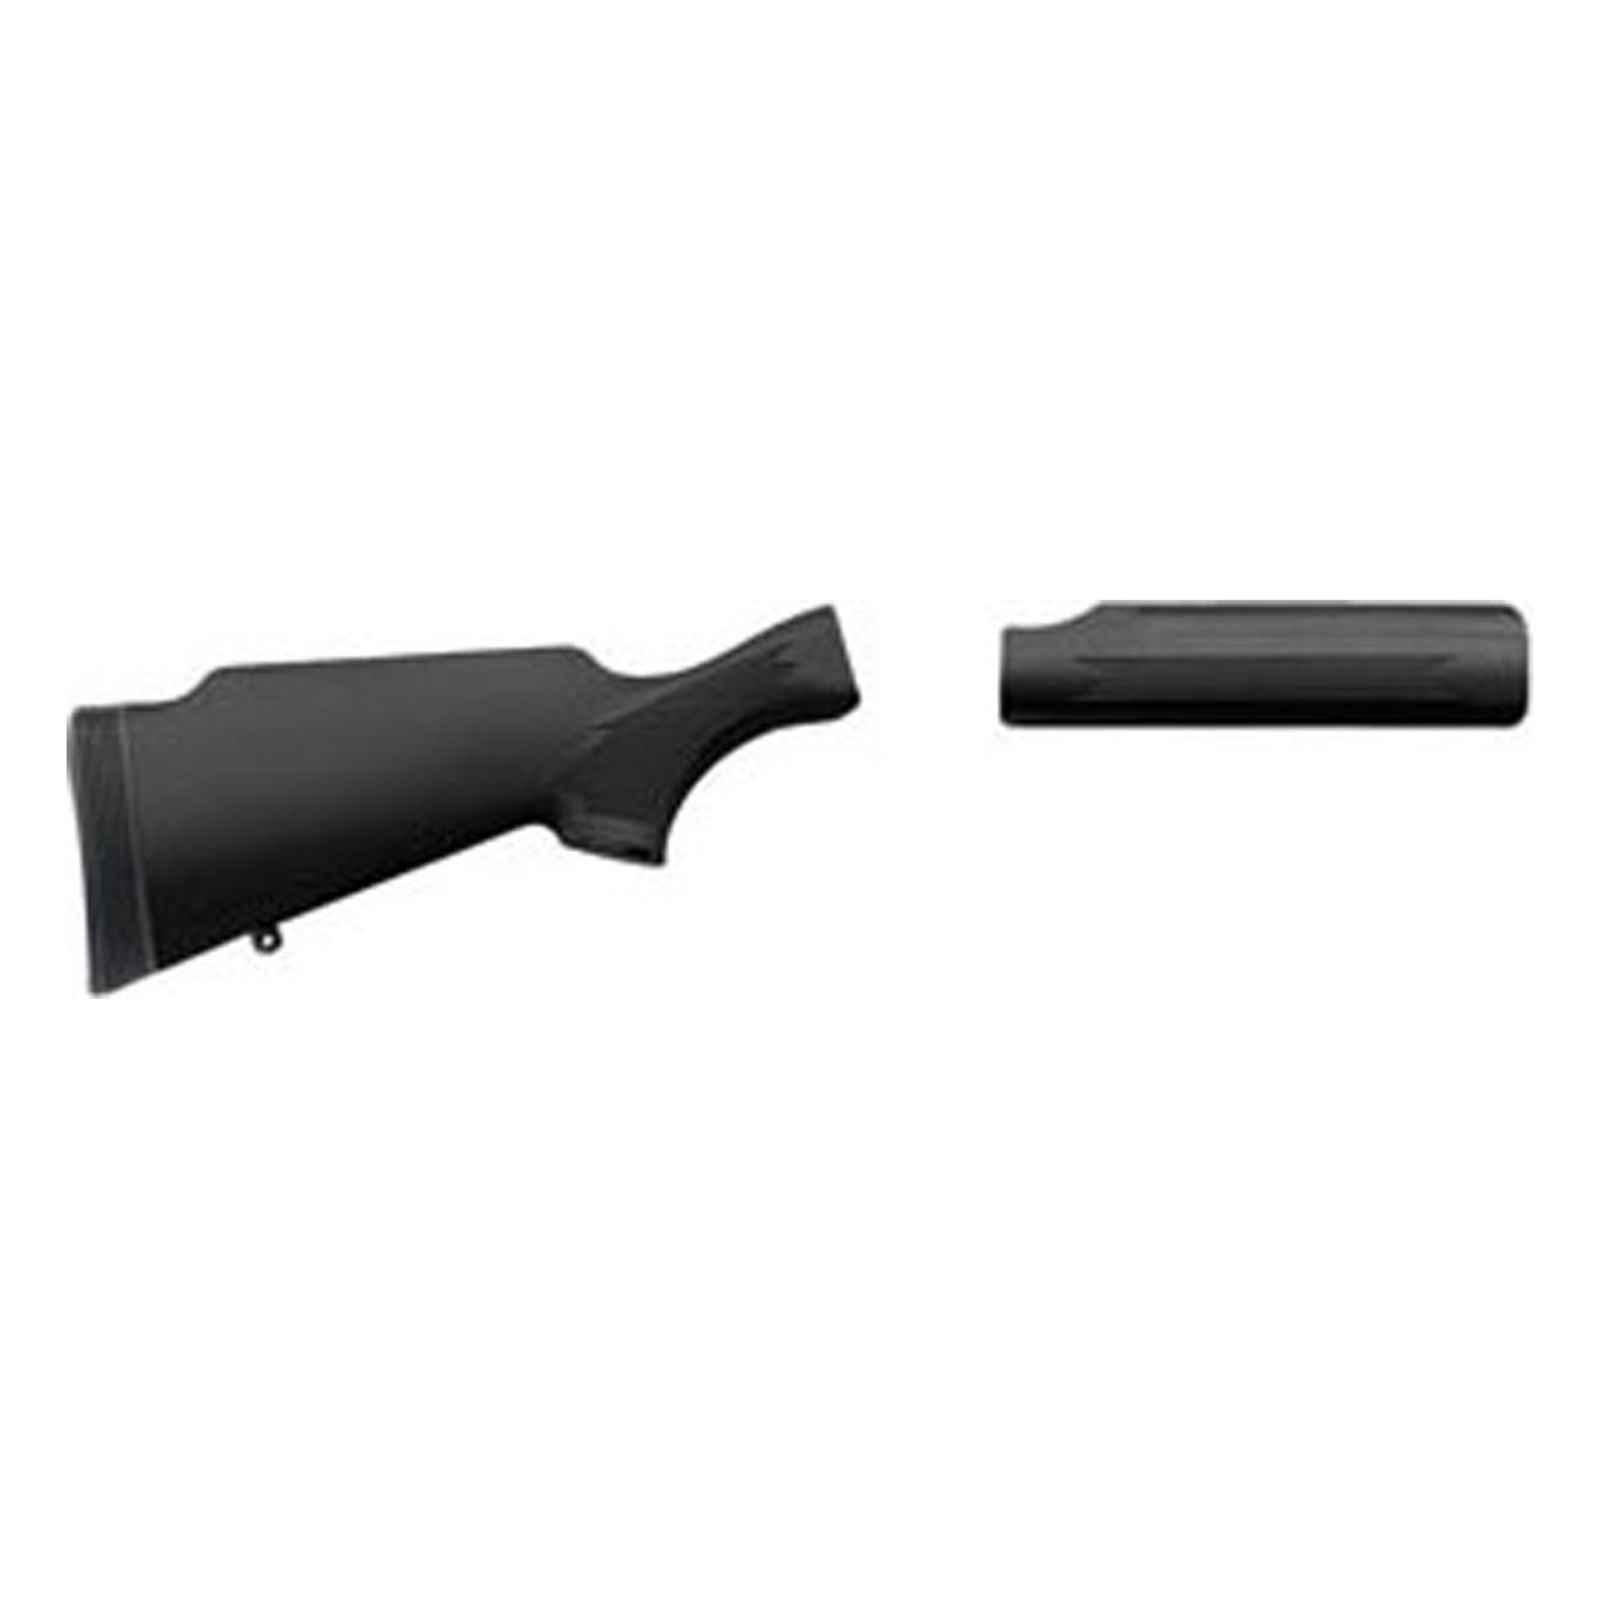 Remington 18611 870 12-Gauge Shotgun Youth Synthetic Stoc...